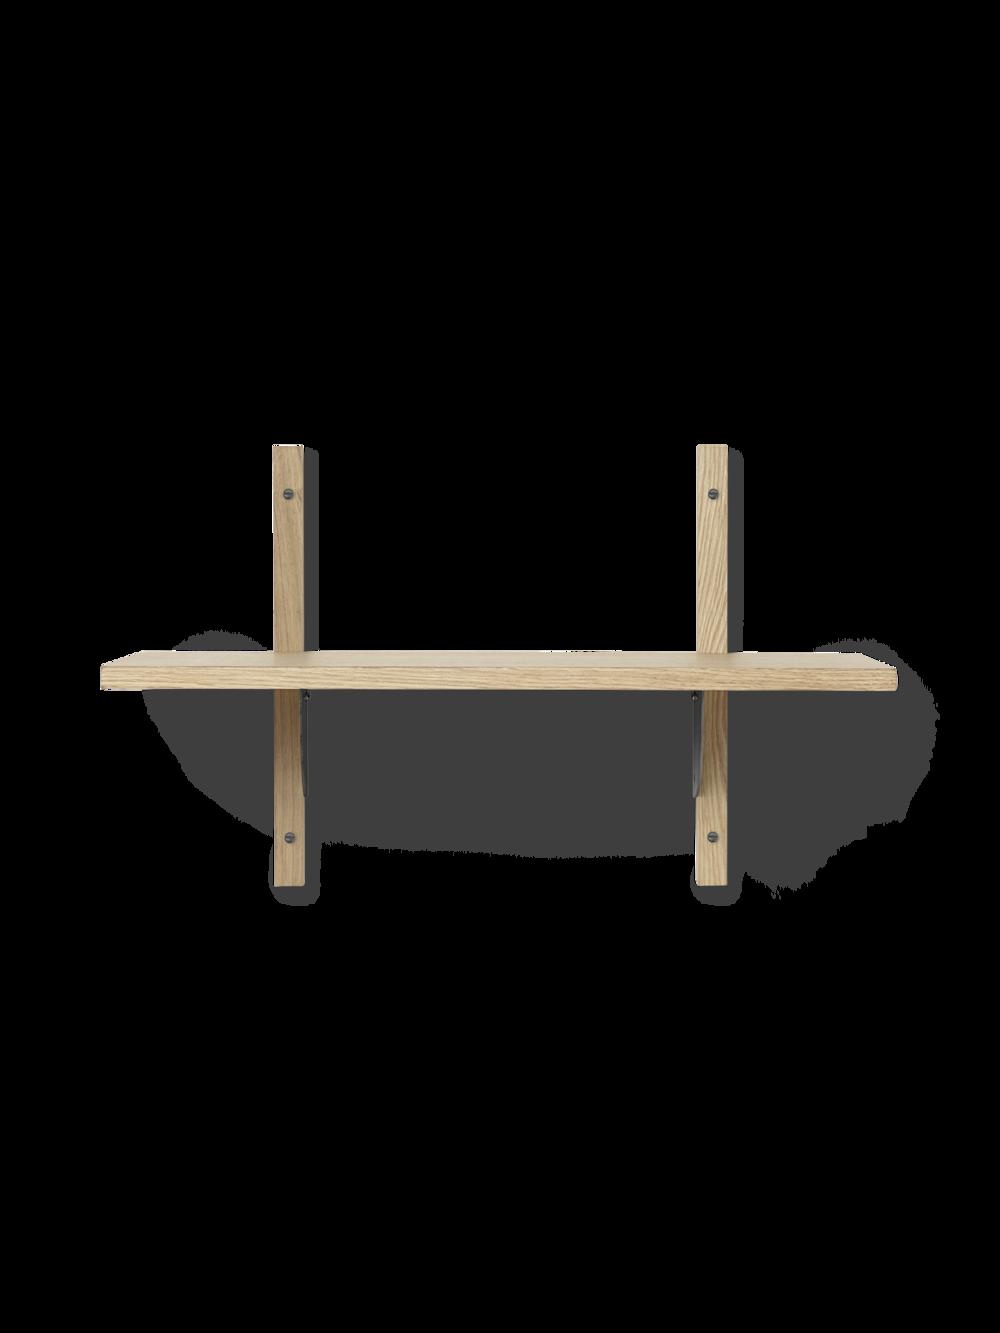 Sector Shelf - Single - Narrow - Natural - Black Brass